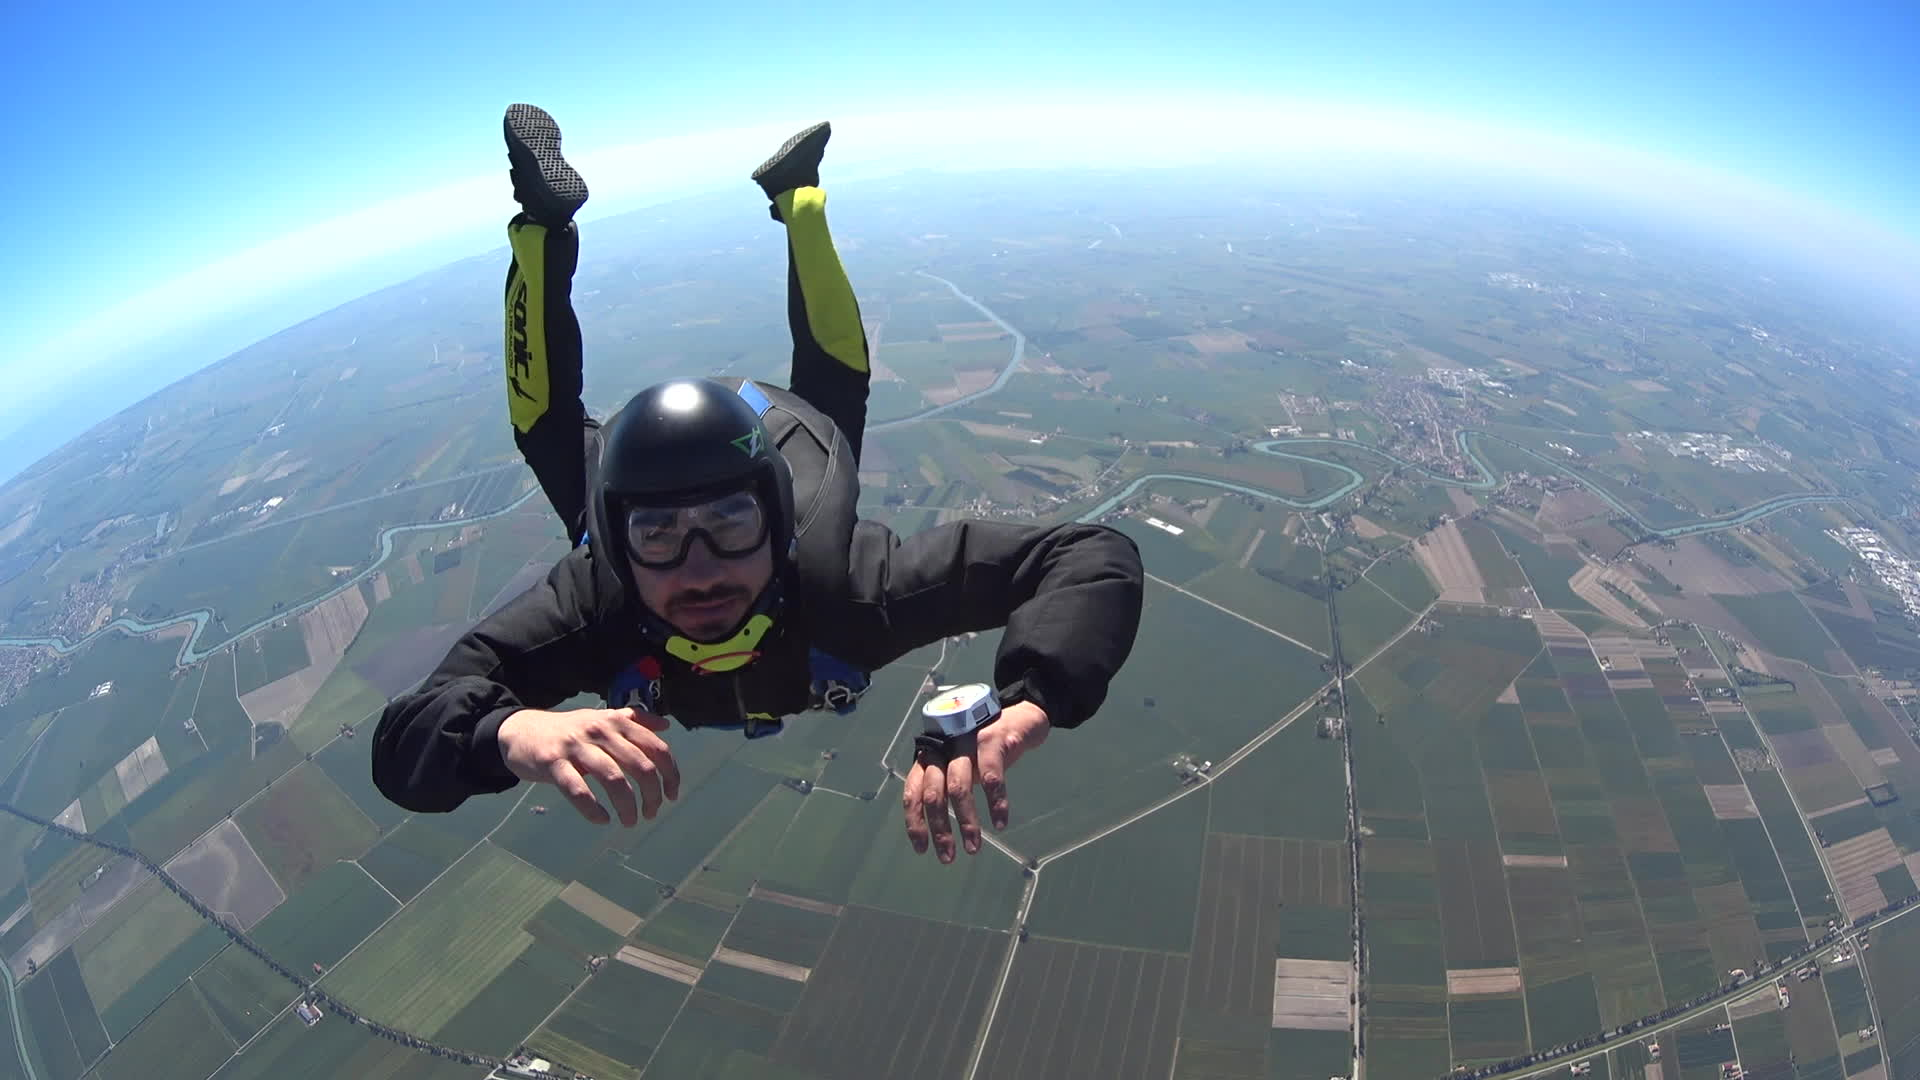 skydive, skydiving, high high five GIFs